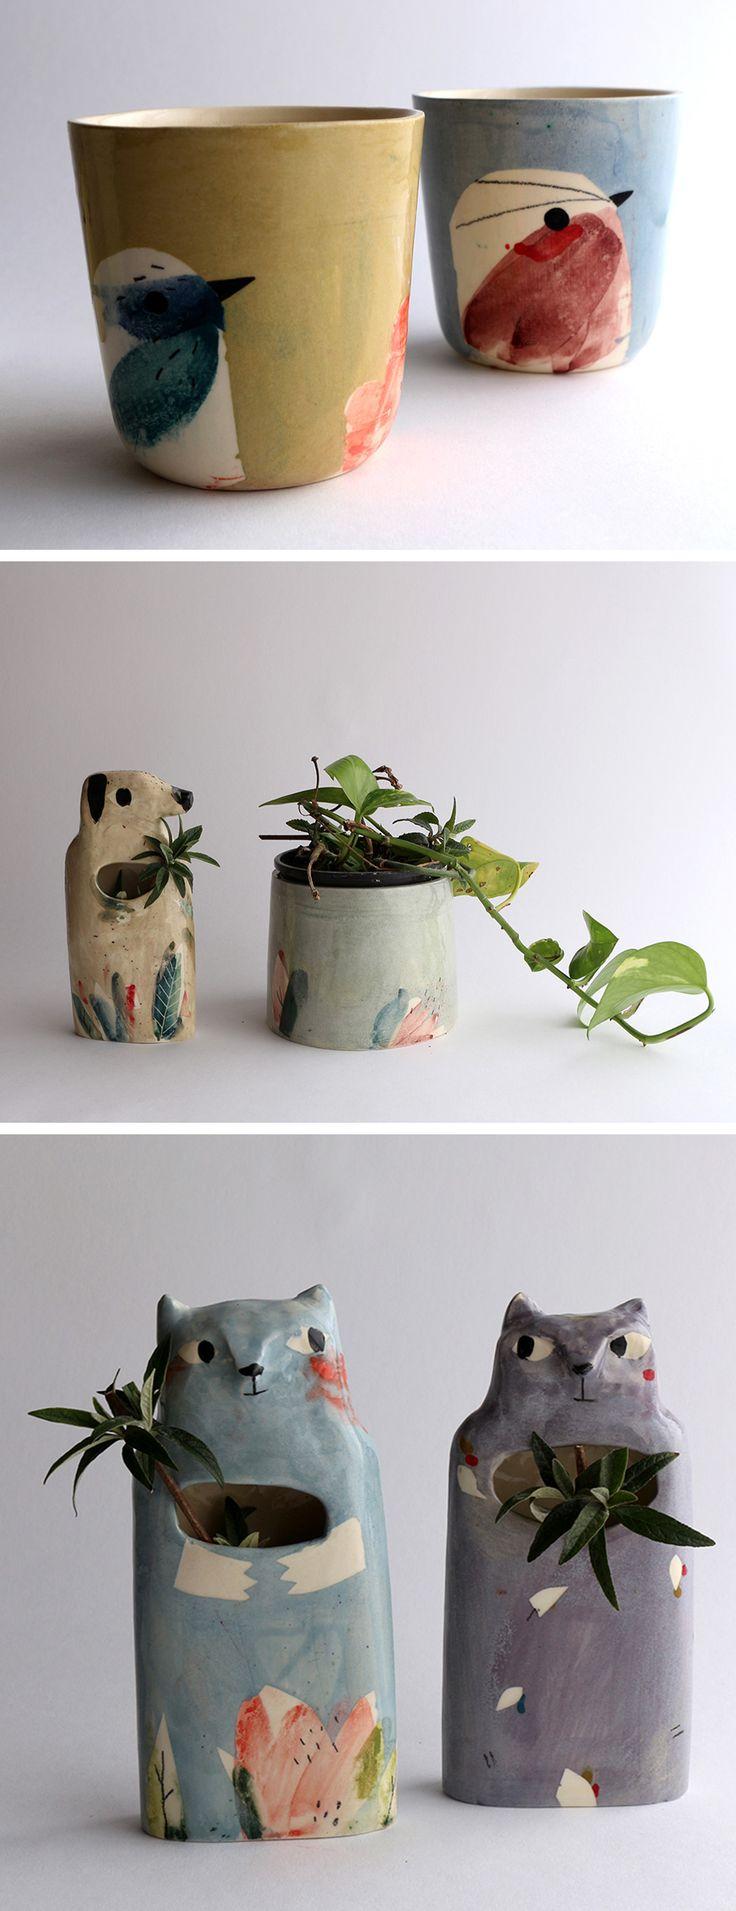 Painted ceramics by Elise Lefebvre | illustrated ceramics | modern ceramics | animal planters